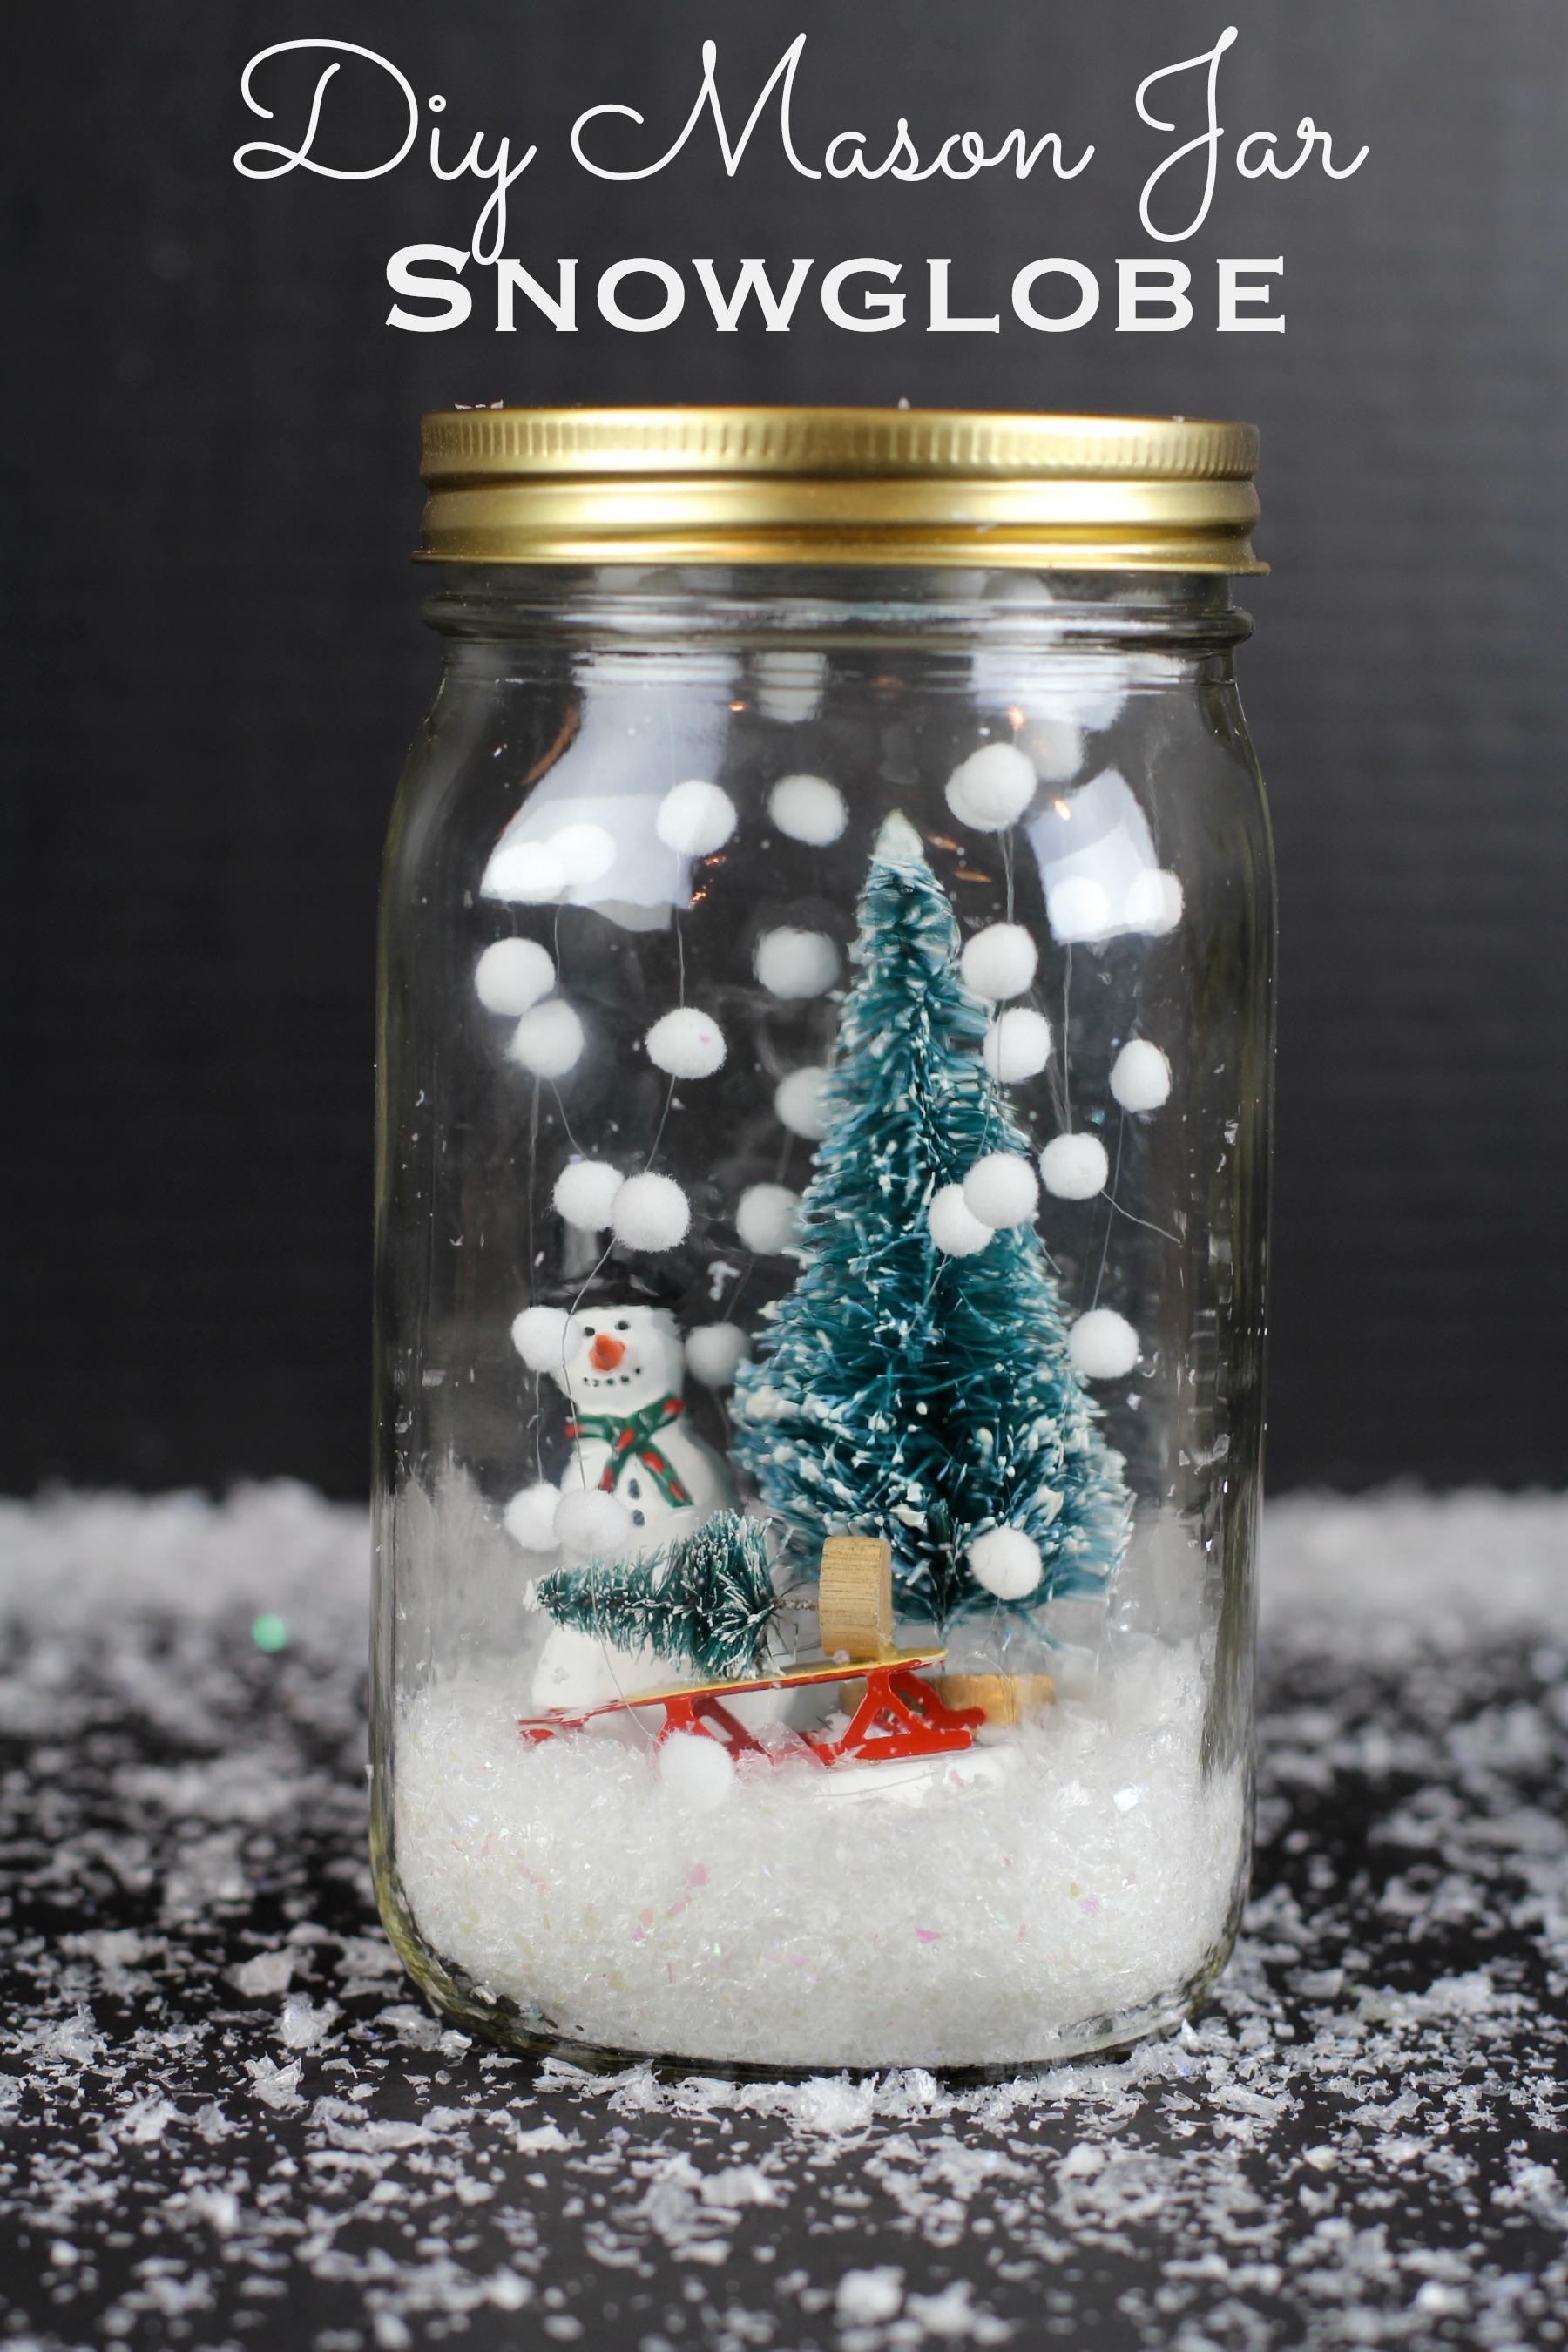 snowglobe-mason-jar-christmas-gift-diy.jpg